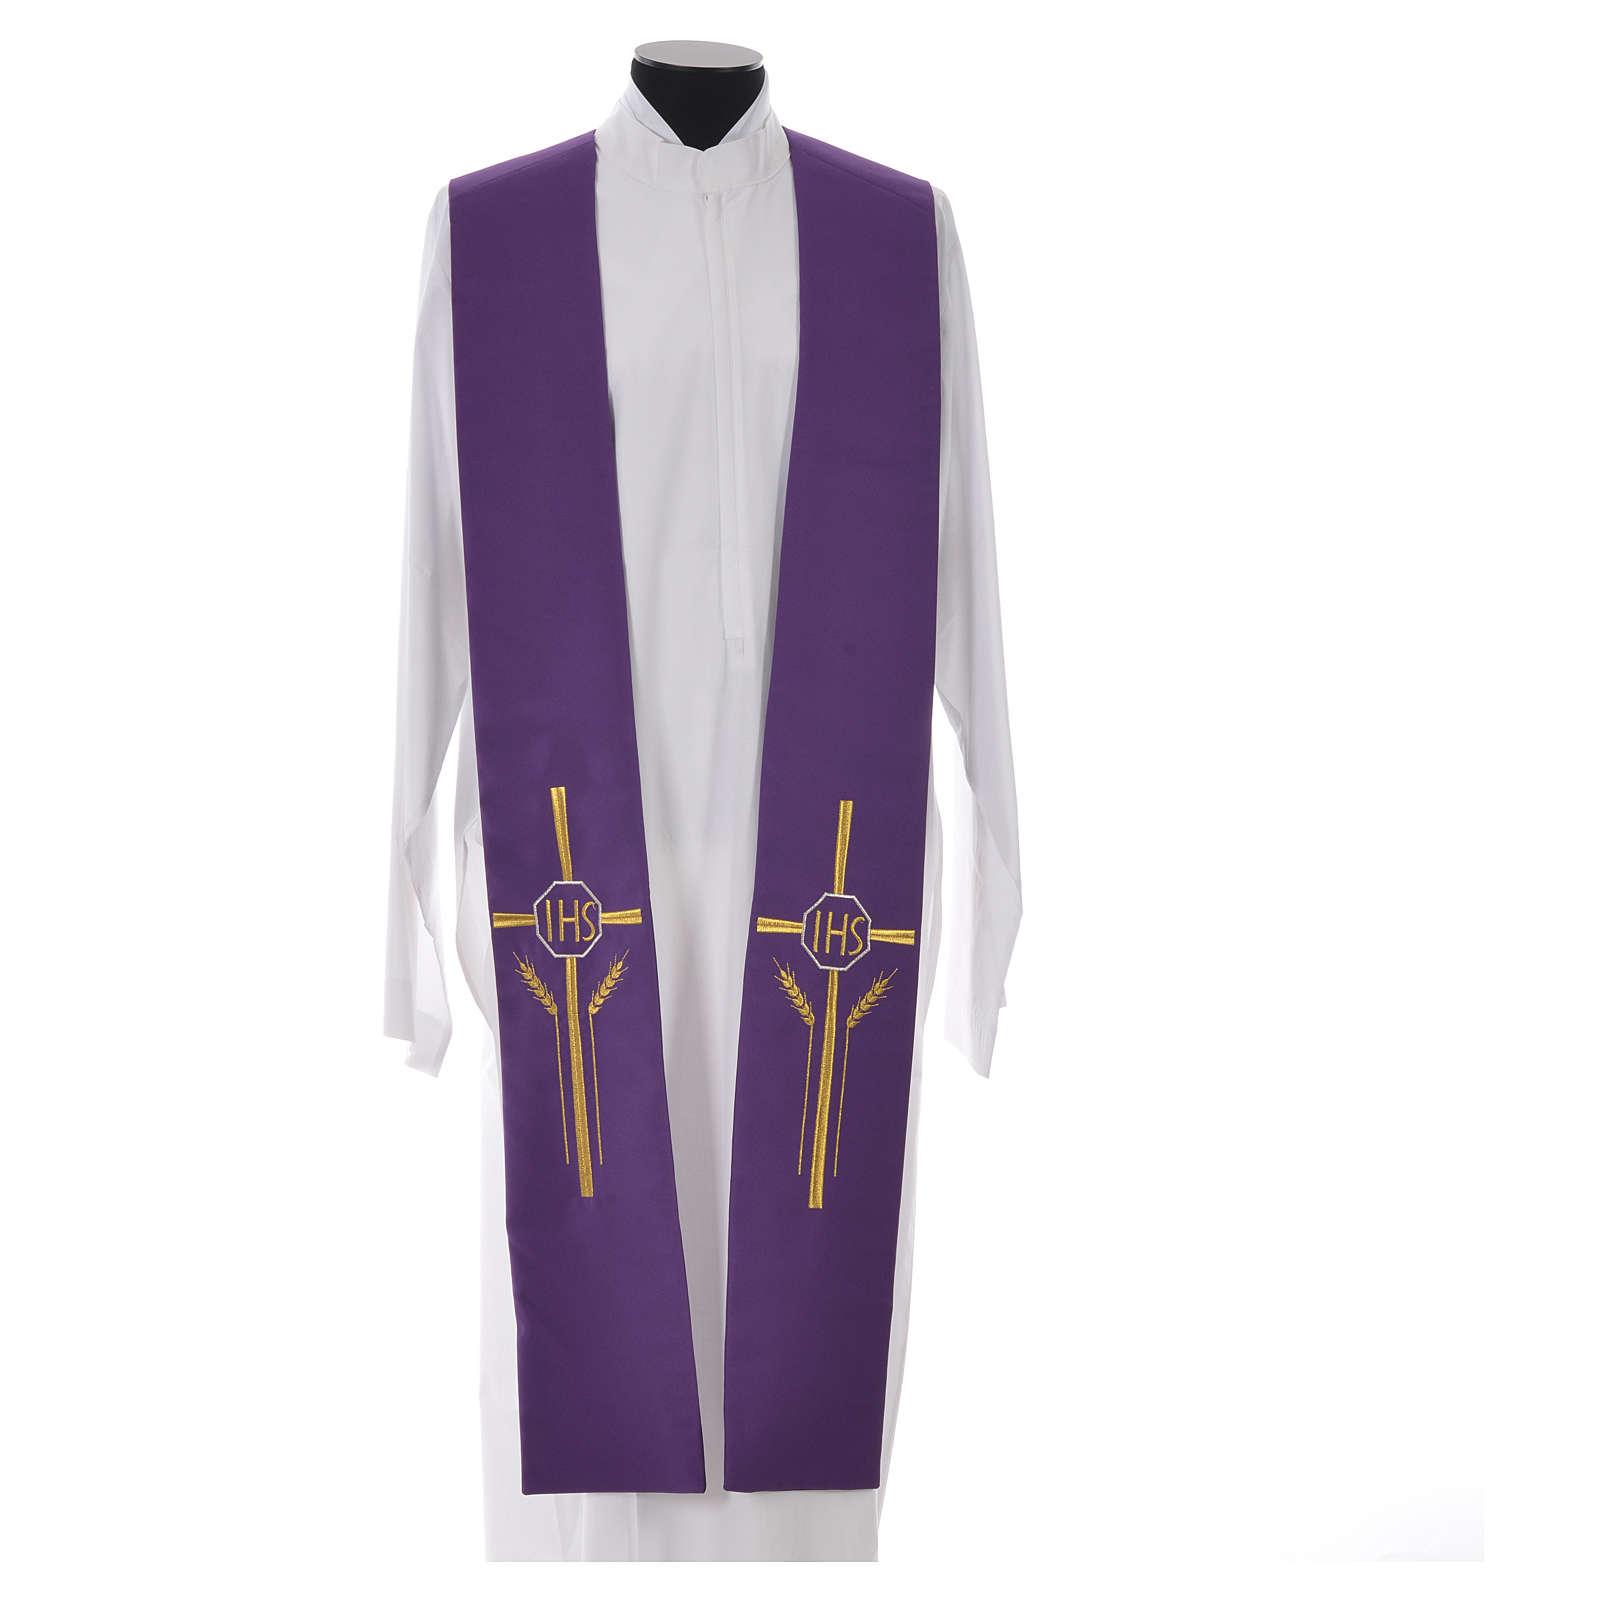 Etole IHS croix épis 100% polyester 4